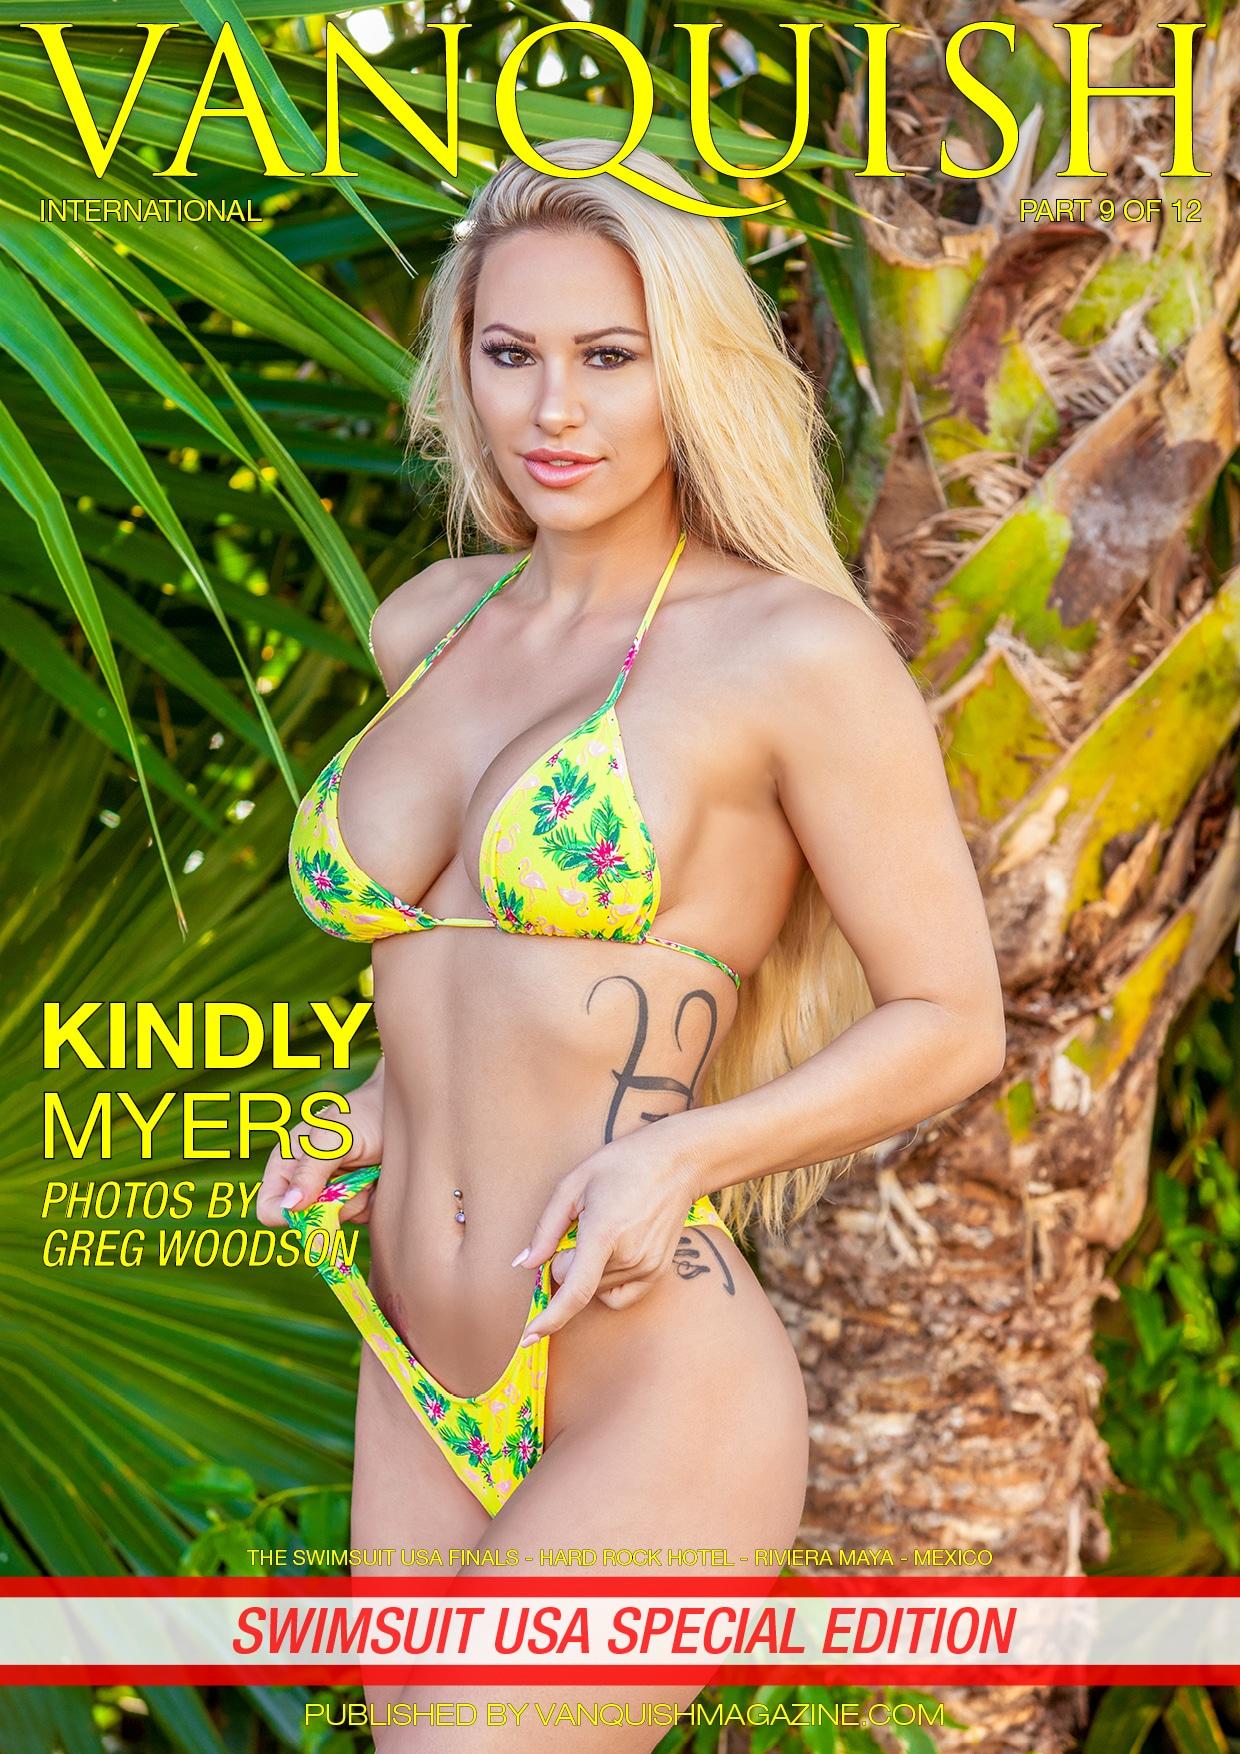 Vanquish Magazine - Swimsuit USA 2018 - Part 9 - Kindly Myers